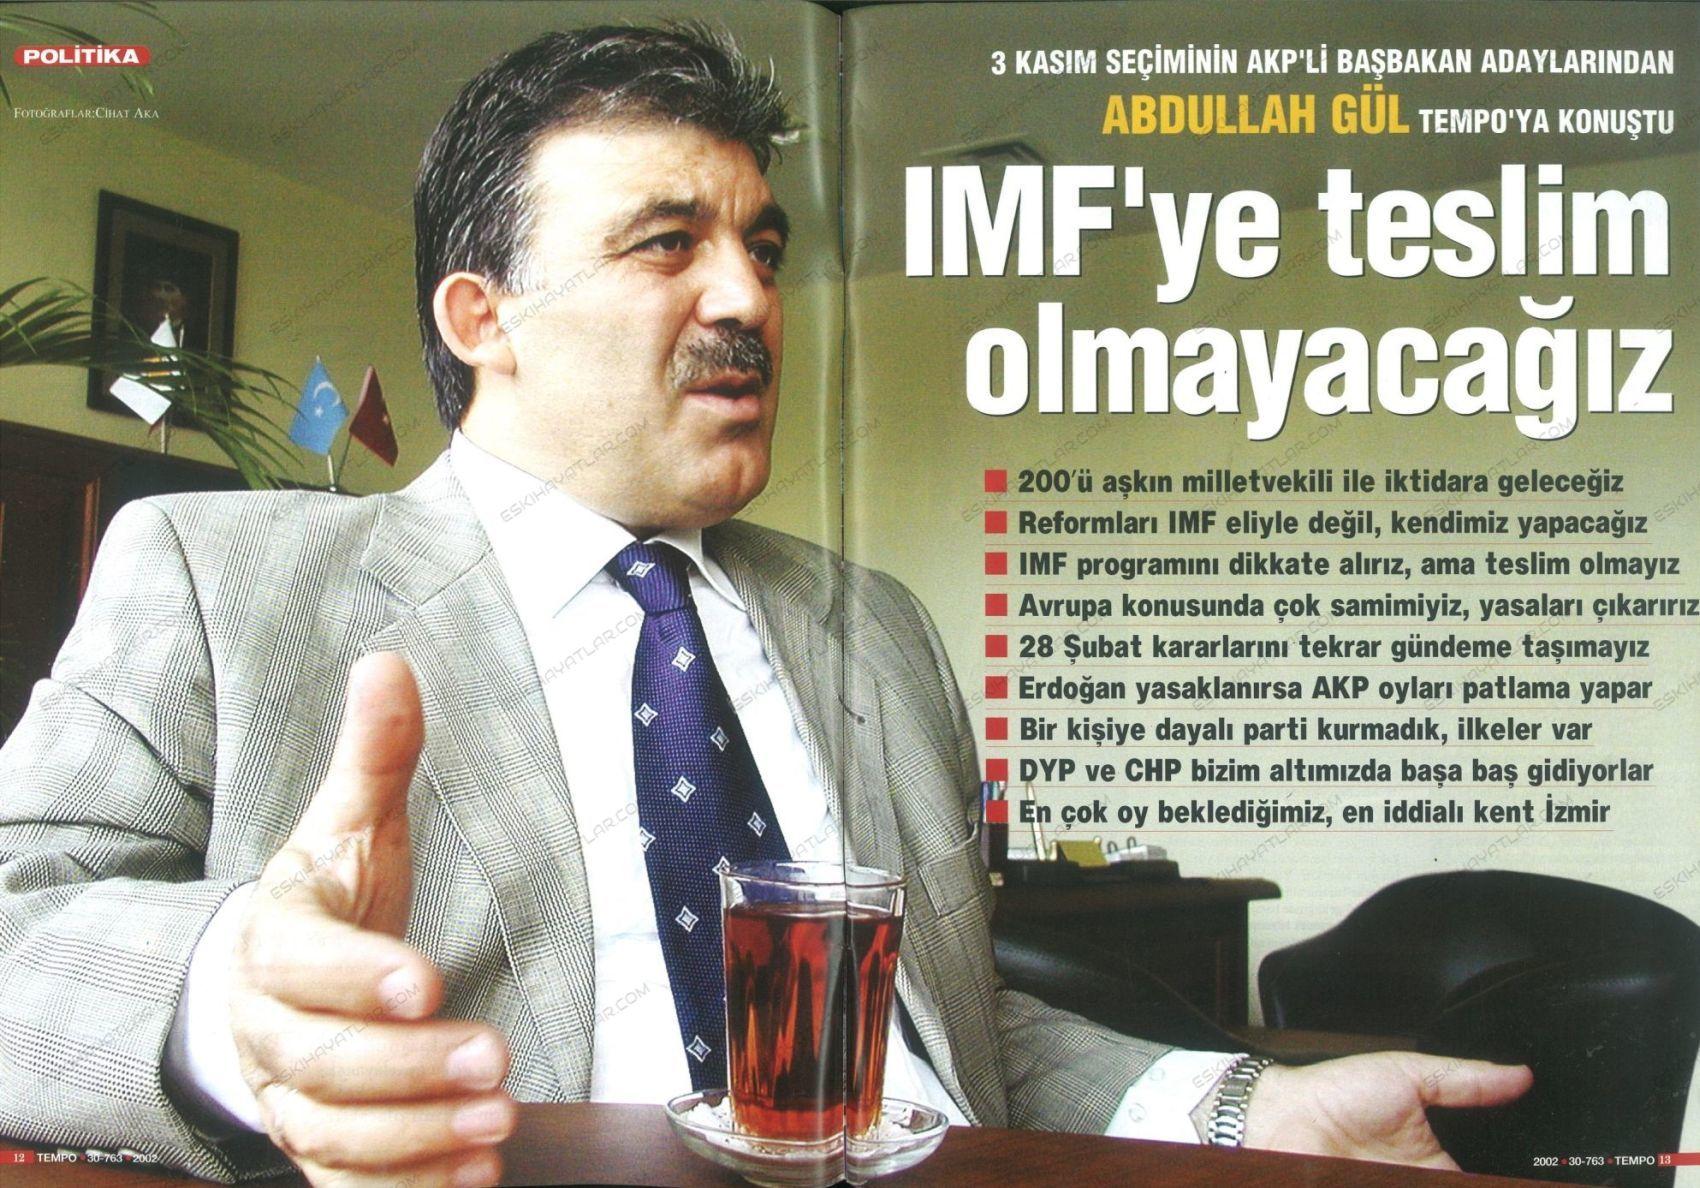 0172-abdullah-gul-2002-tek-basina-iktidar-olacagiz-tempo-dergisi-adalet-ve-kalkinma-partisi (3)